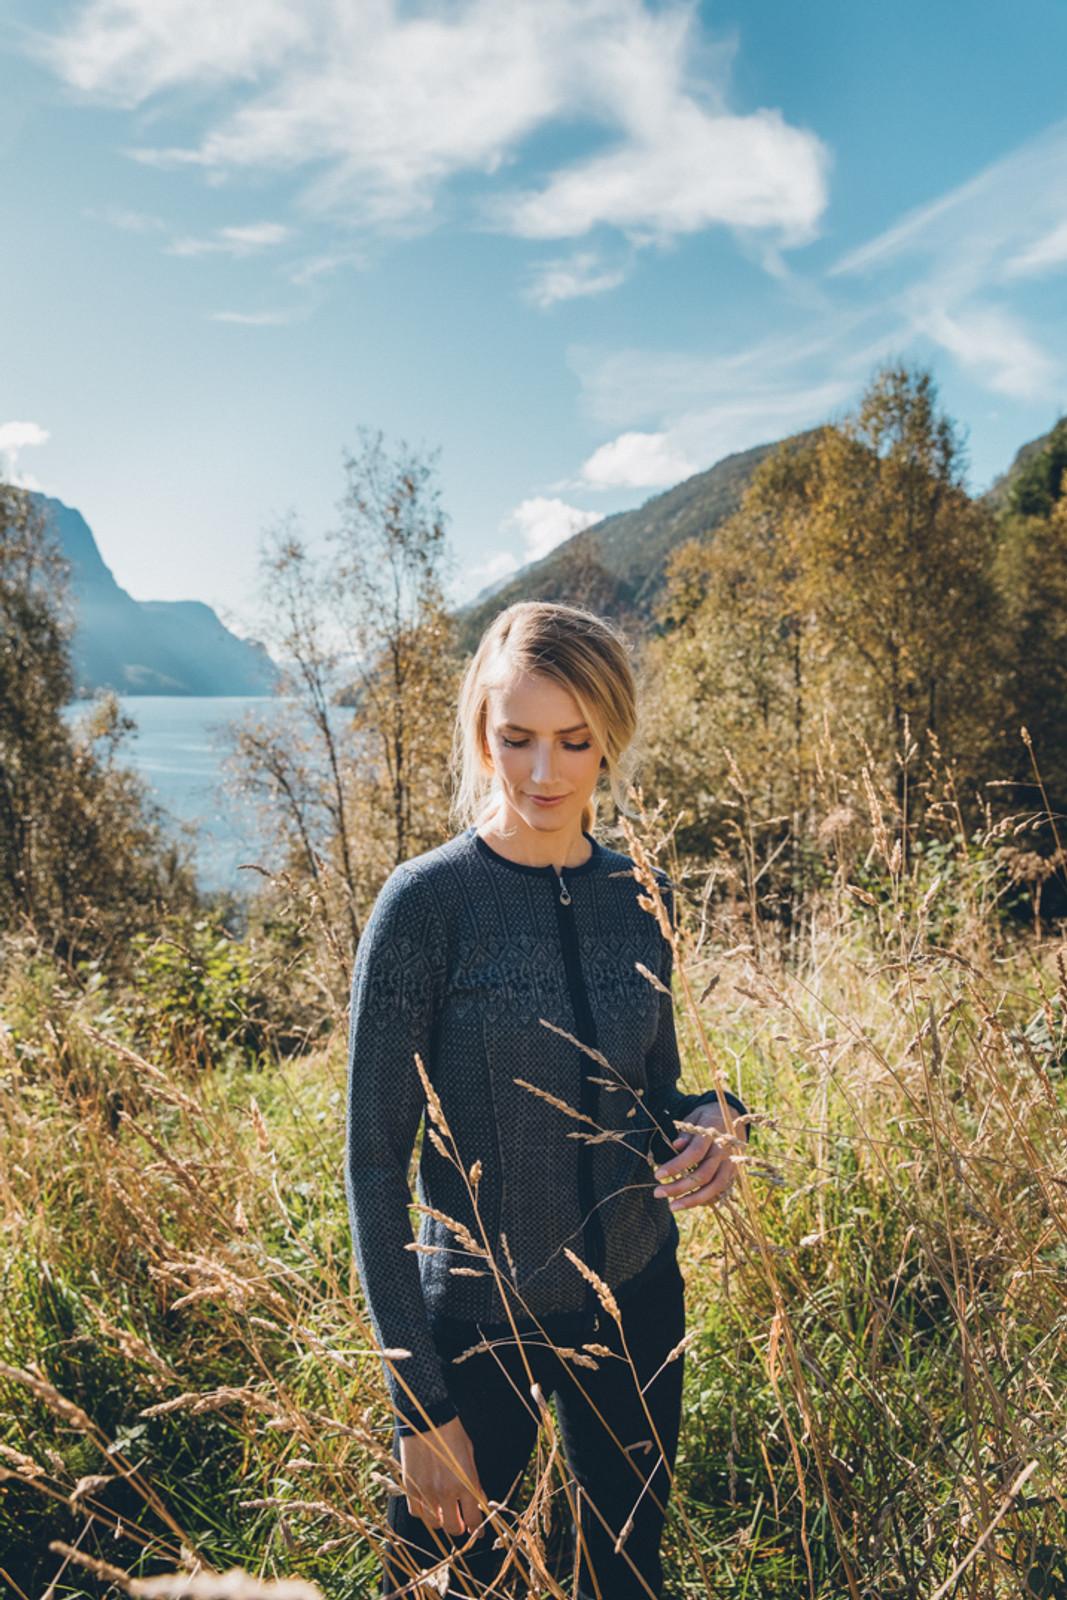 Woman walking through field wearing Dale of Norway's Sigrid Ladies Cardigan in Electric Storm/Smoke, 82071-C